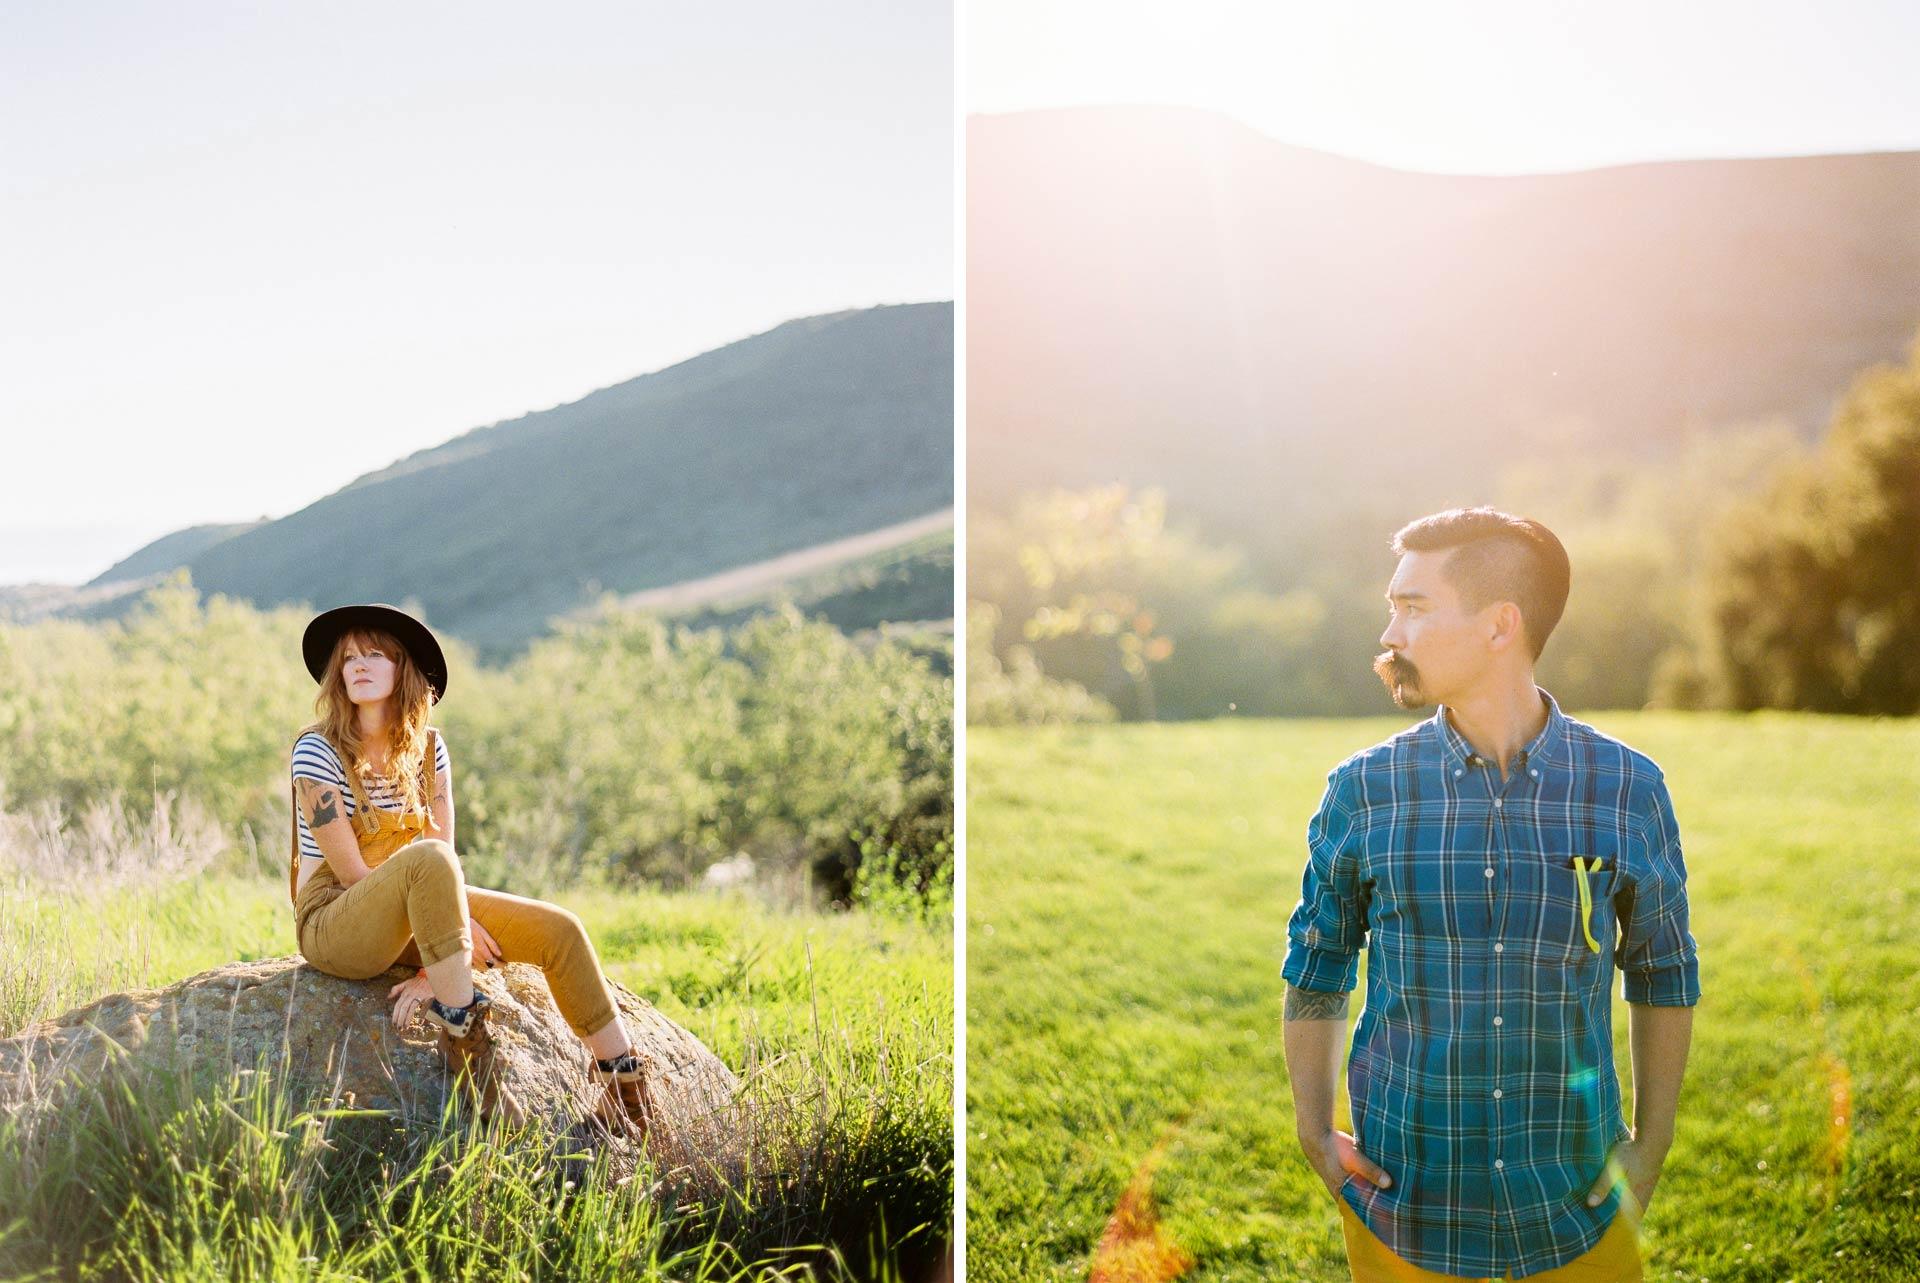 Field_Trip_2015_California_ElCapitanCanyon_JeanLaurentGaudy_MIX009